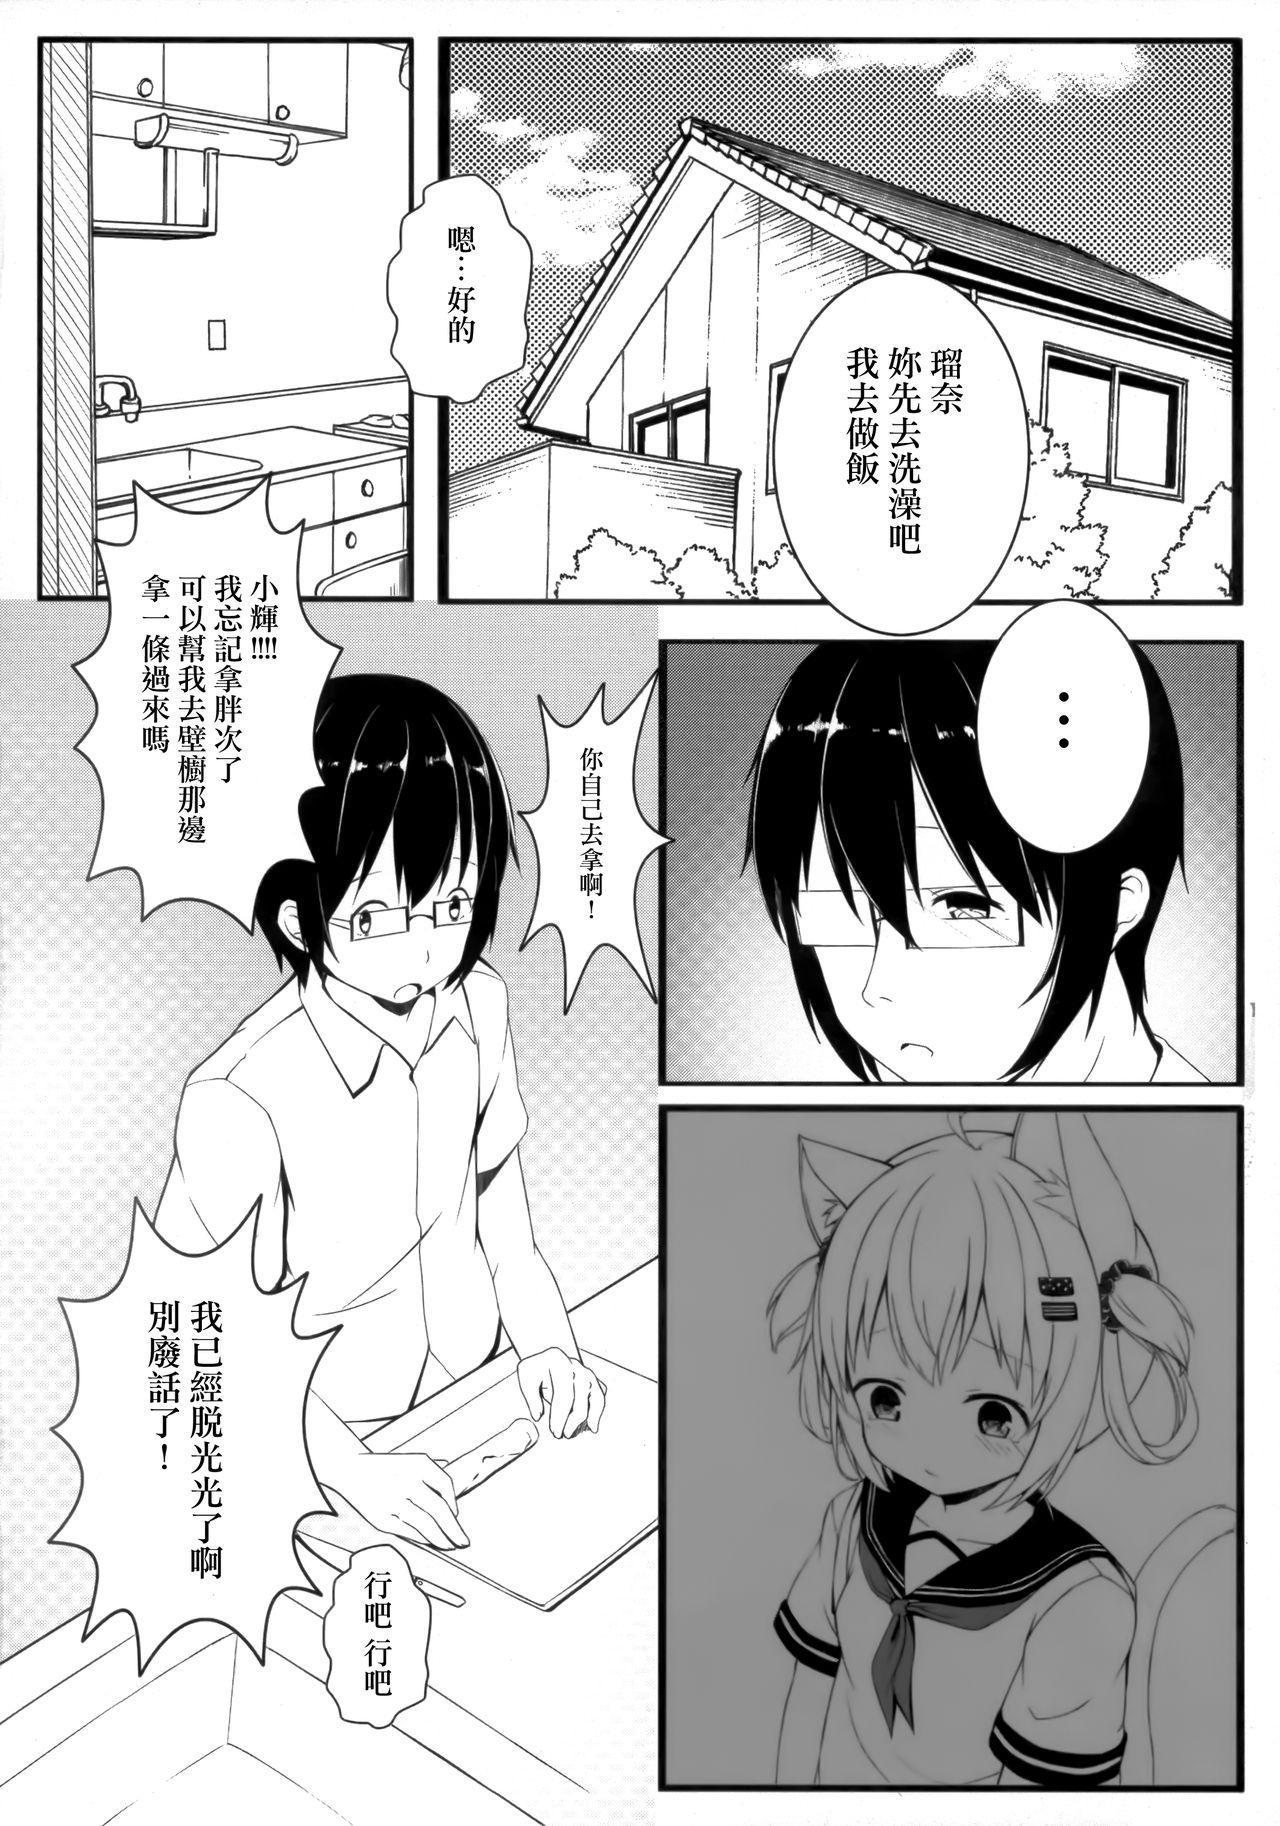 Fuwafuwa no Dousei Life 7